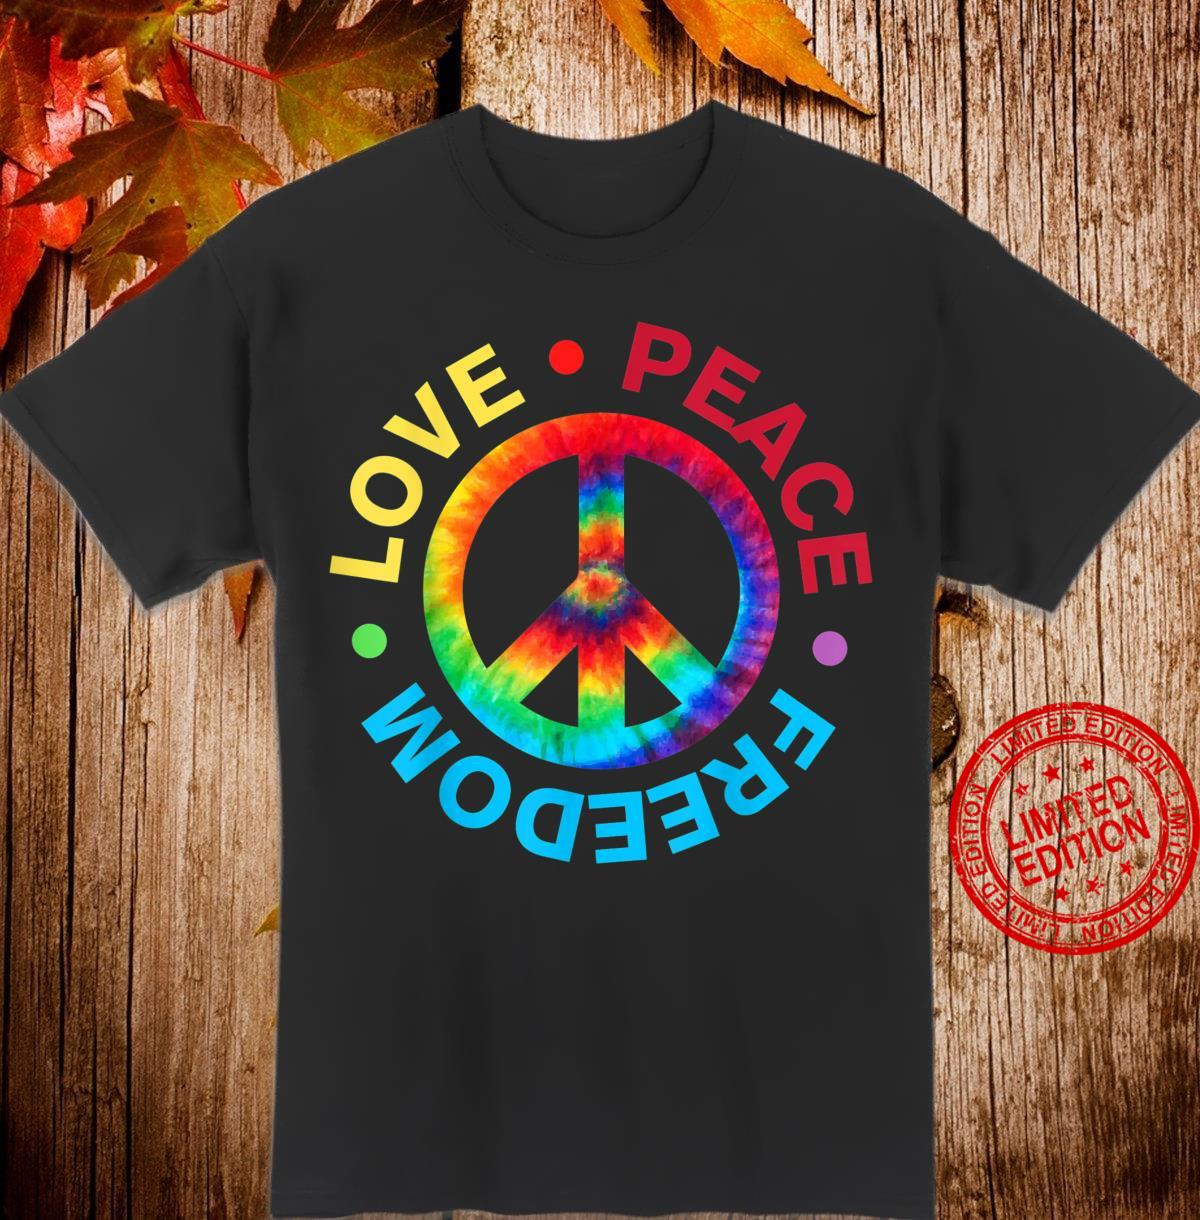 Love Peace Freedom 60's 70's Hippie Costume Tie Die Shirt